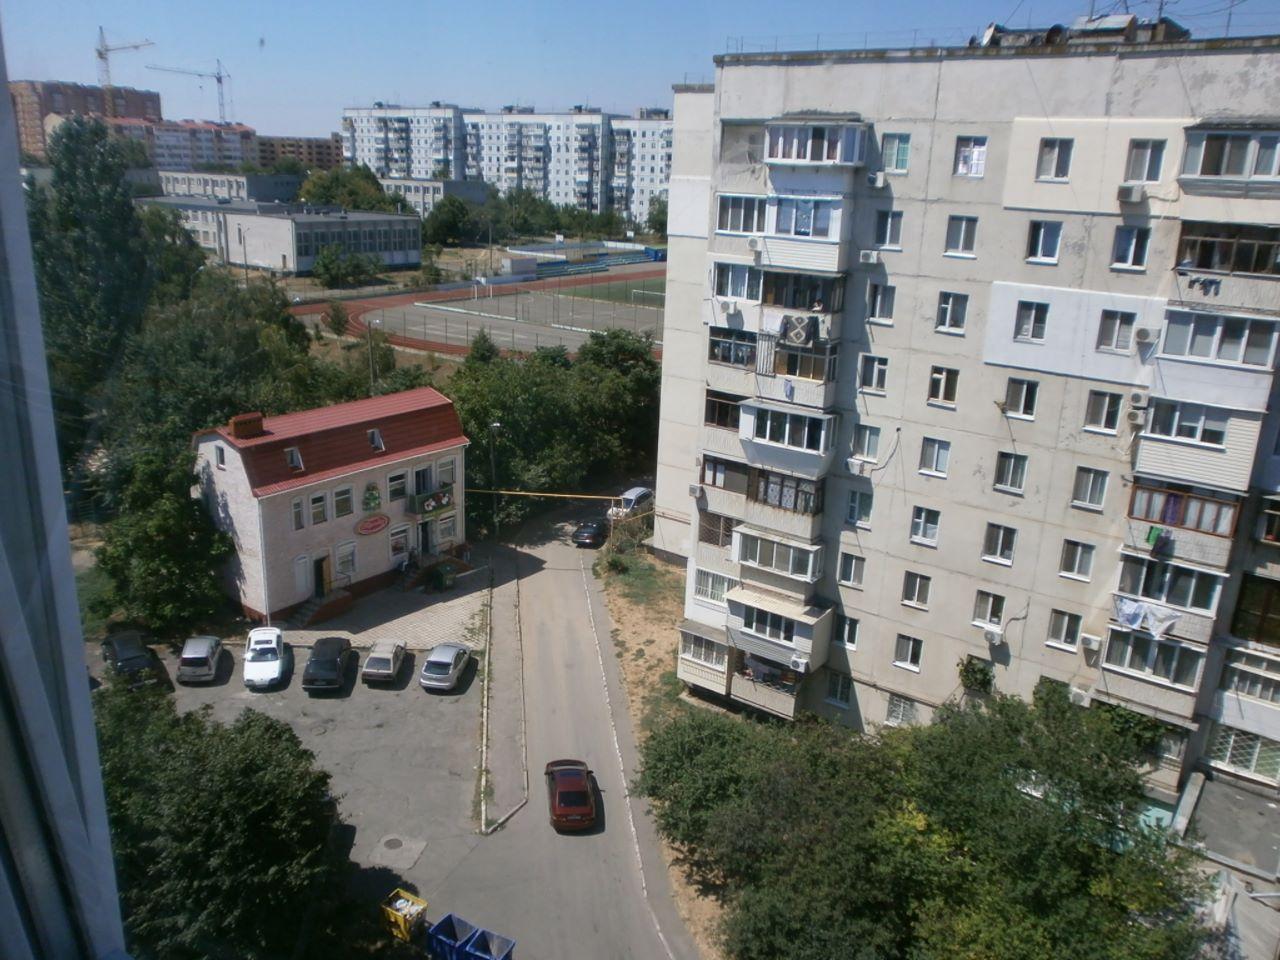 Продается 1-комнатная квартира на ул. Парковая — 36 000 у.е. (фото №4)